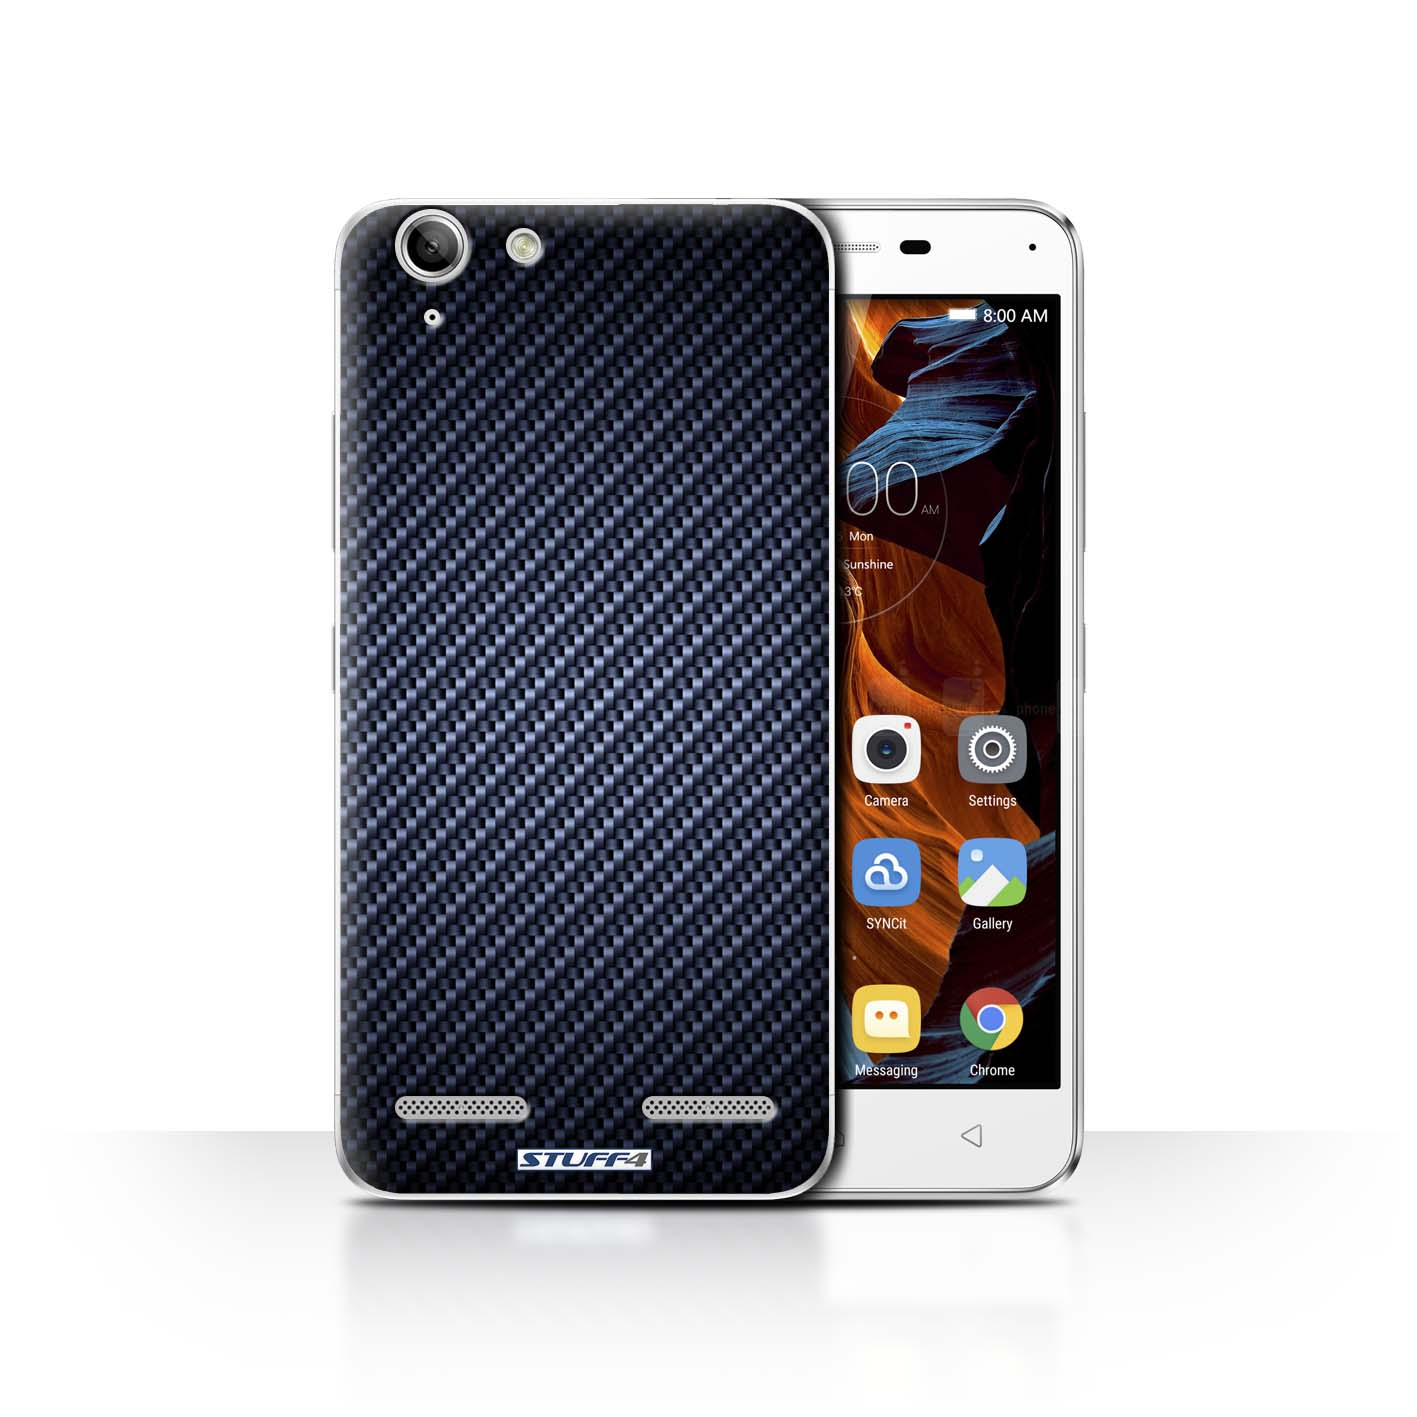 Stuff4 Huelle Case Backcover Fuer Lenovo Vibe K5